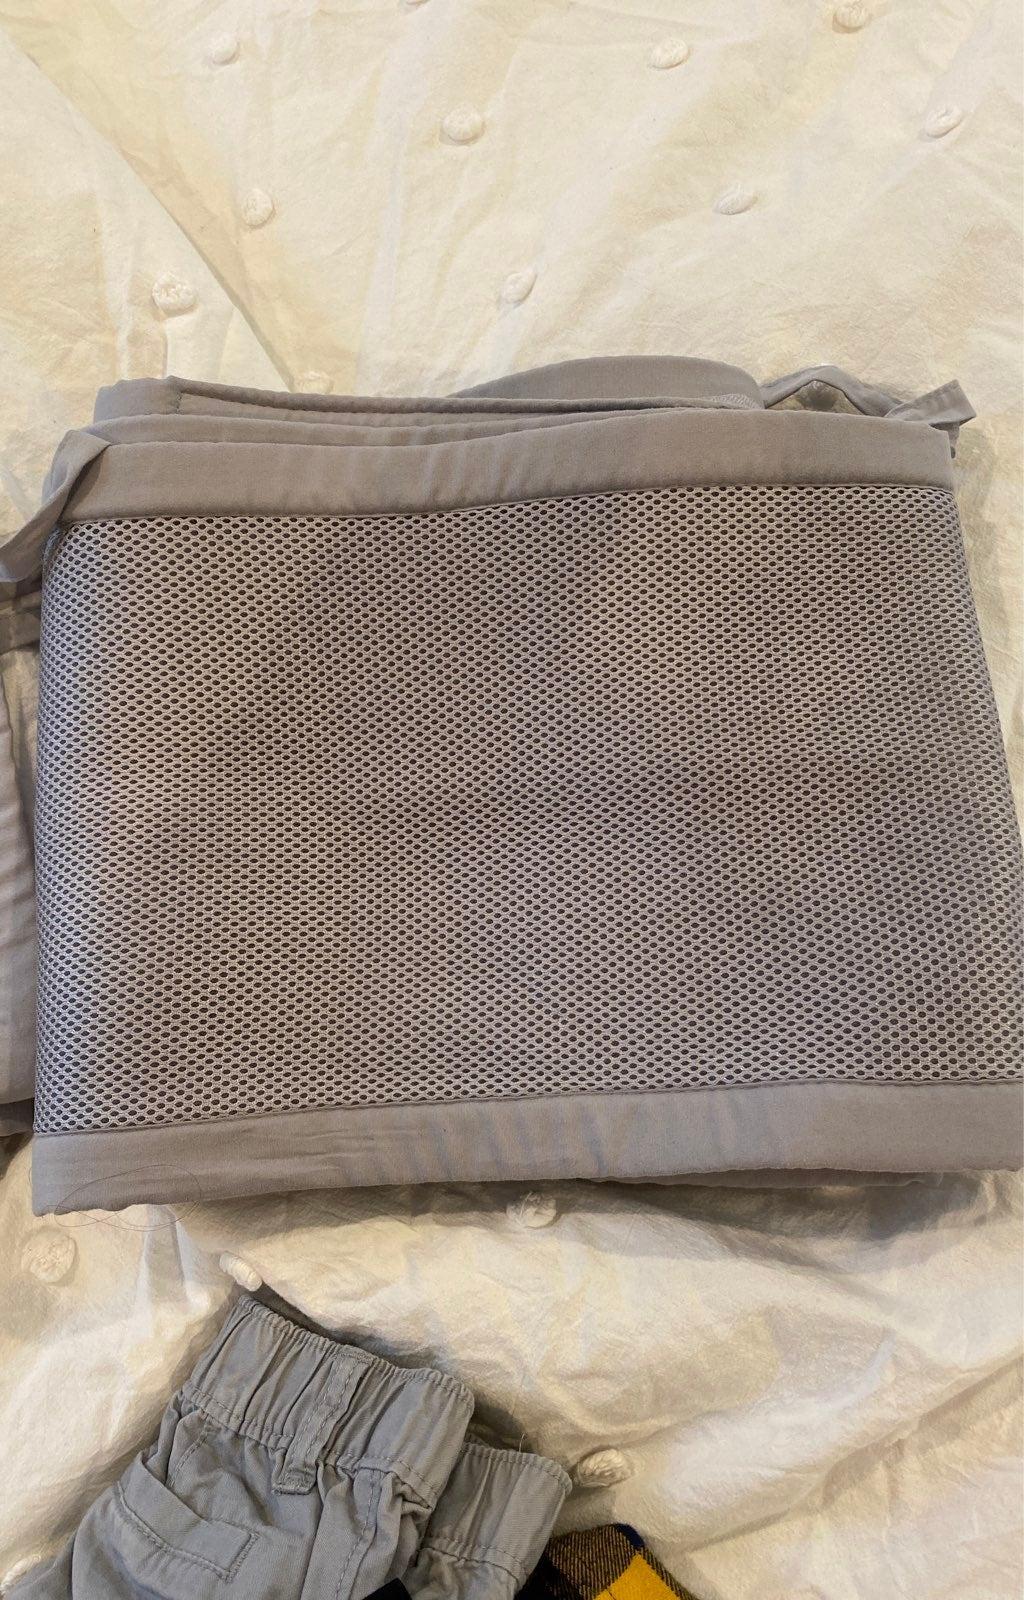 Breathable mesh crib liner